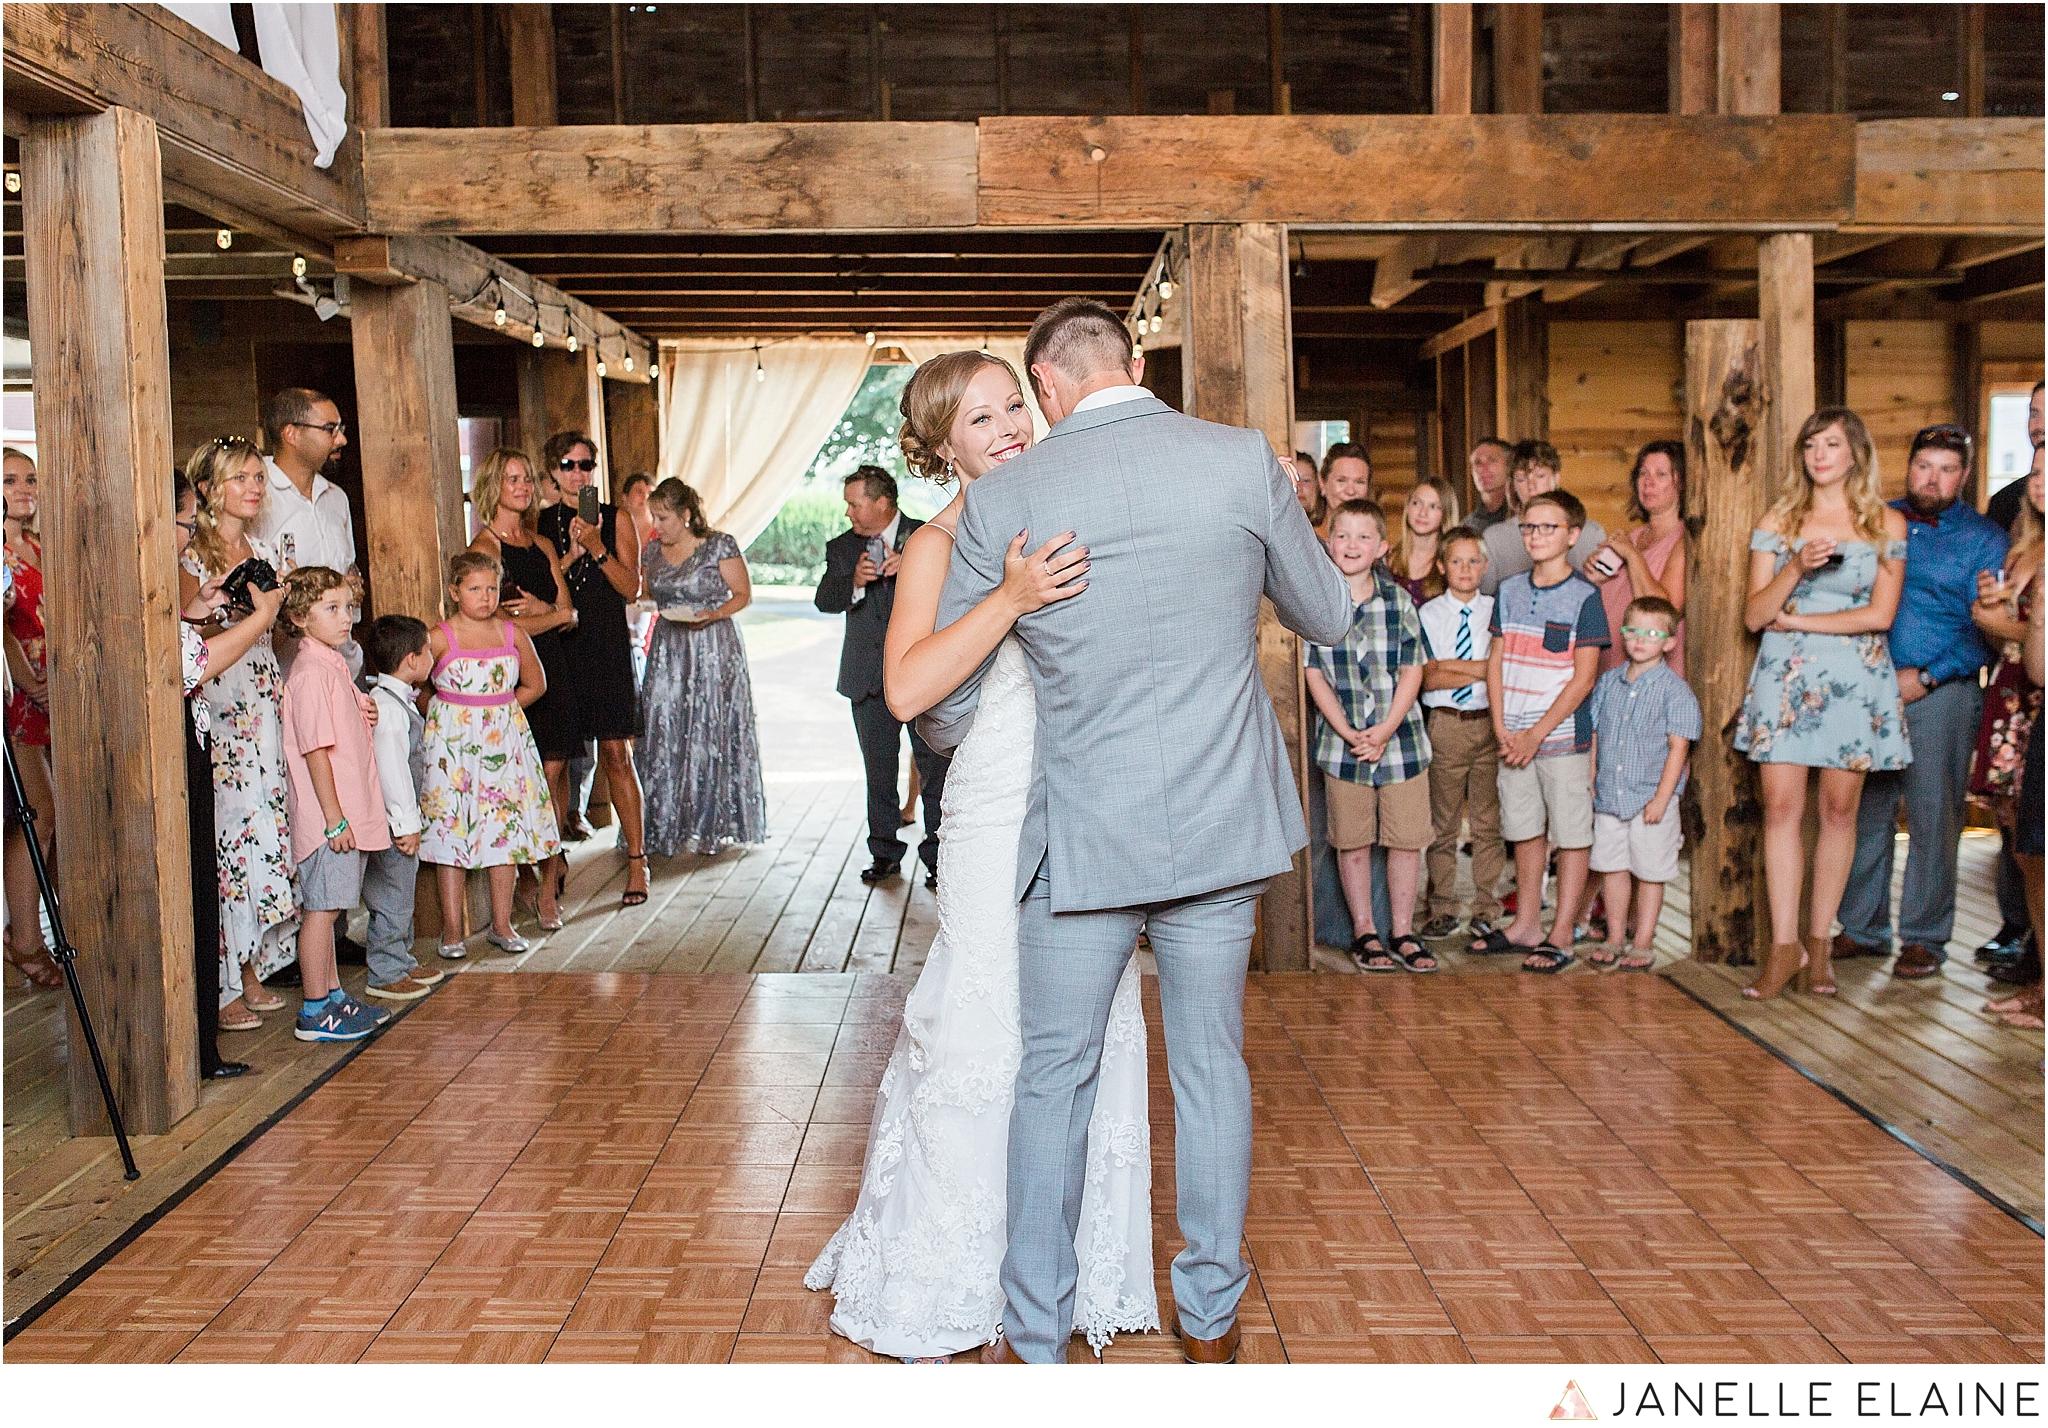 warnsholz-wedding-michigan-photography-janelle elaine photography-185.jpg